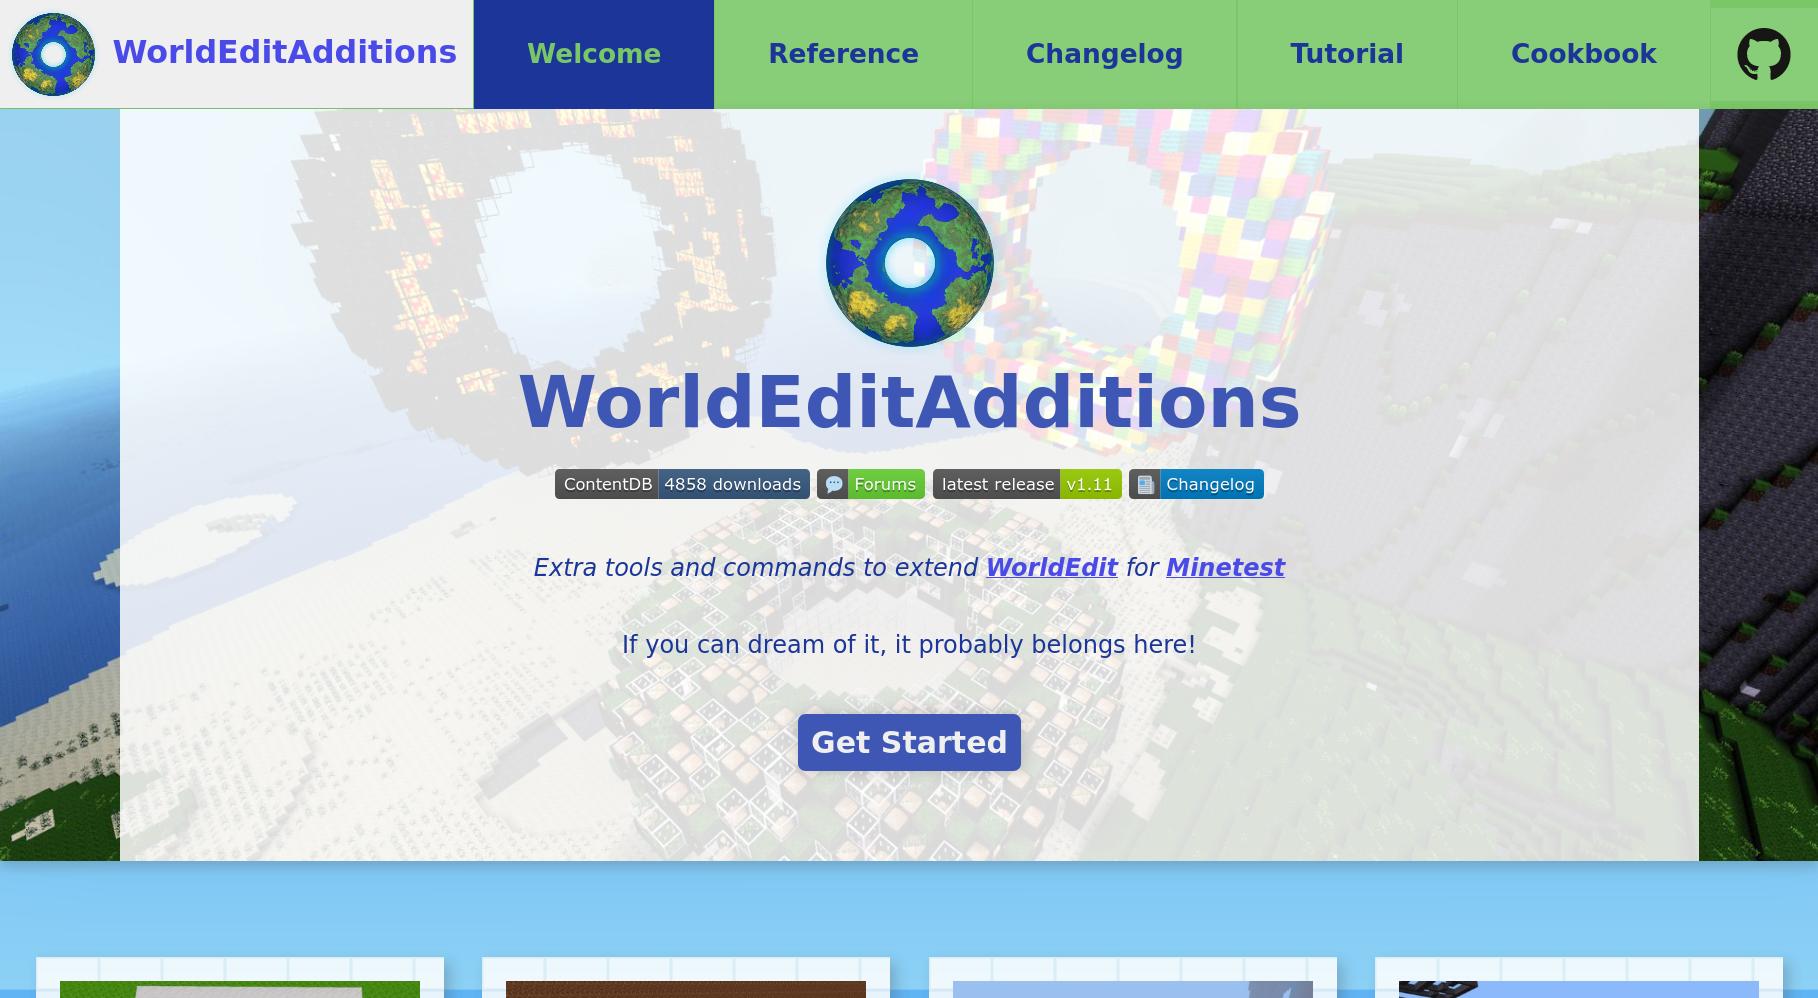 The WorldEditAdditions website